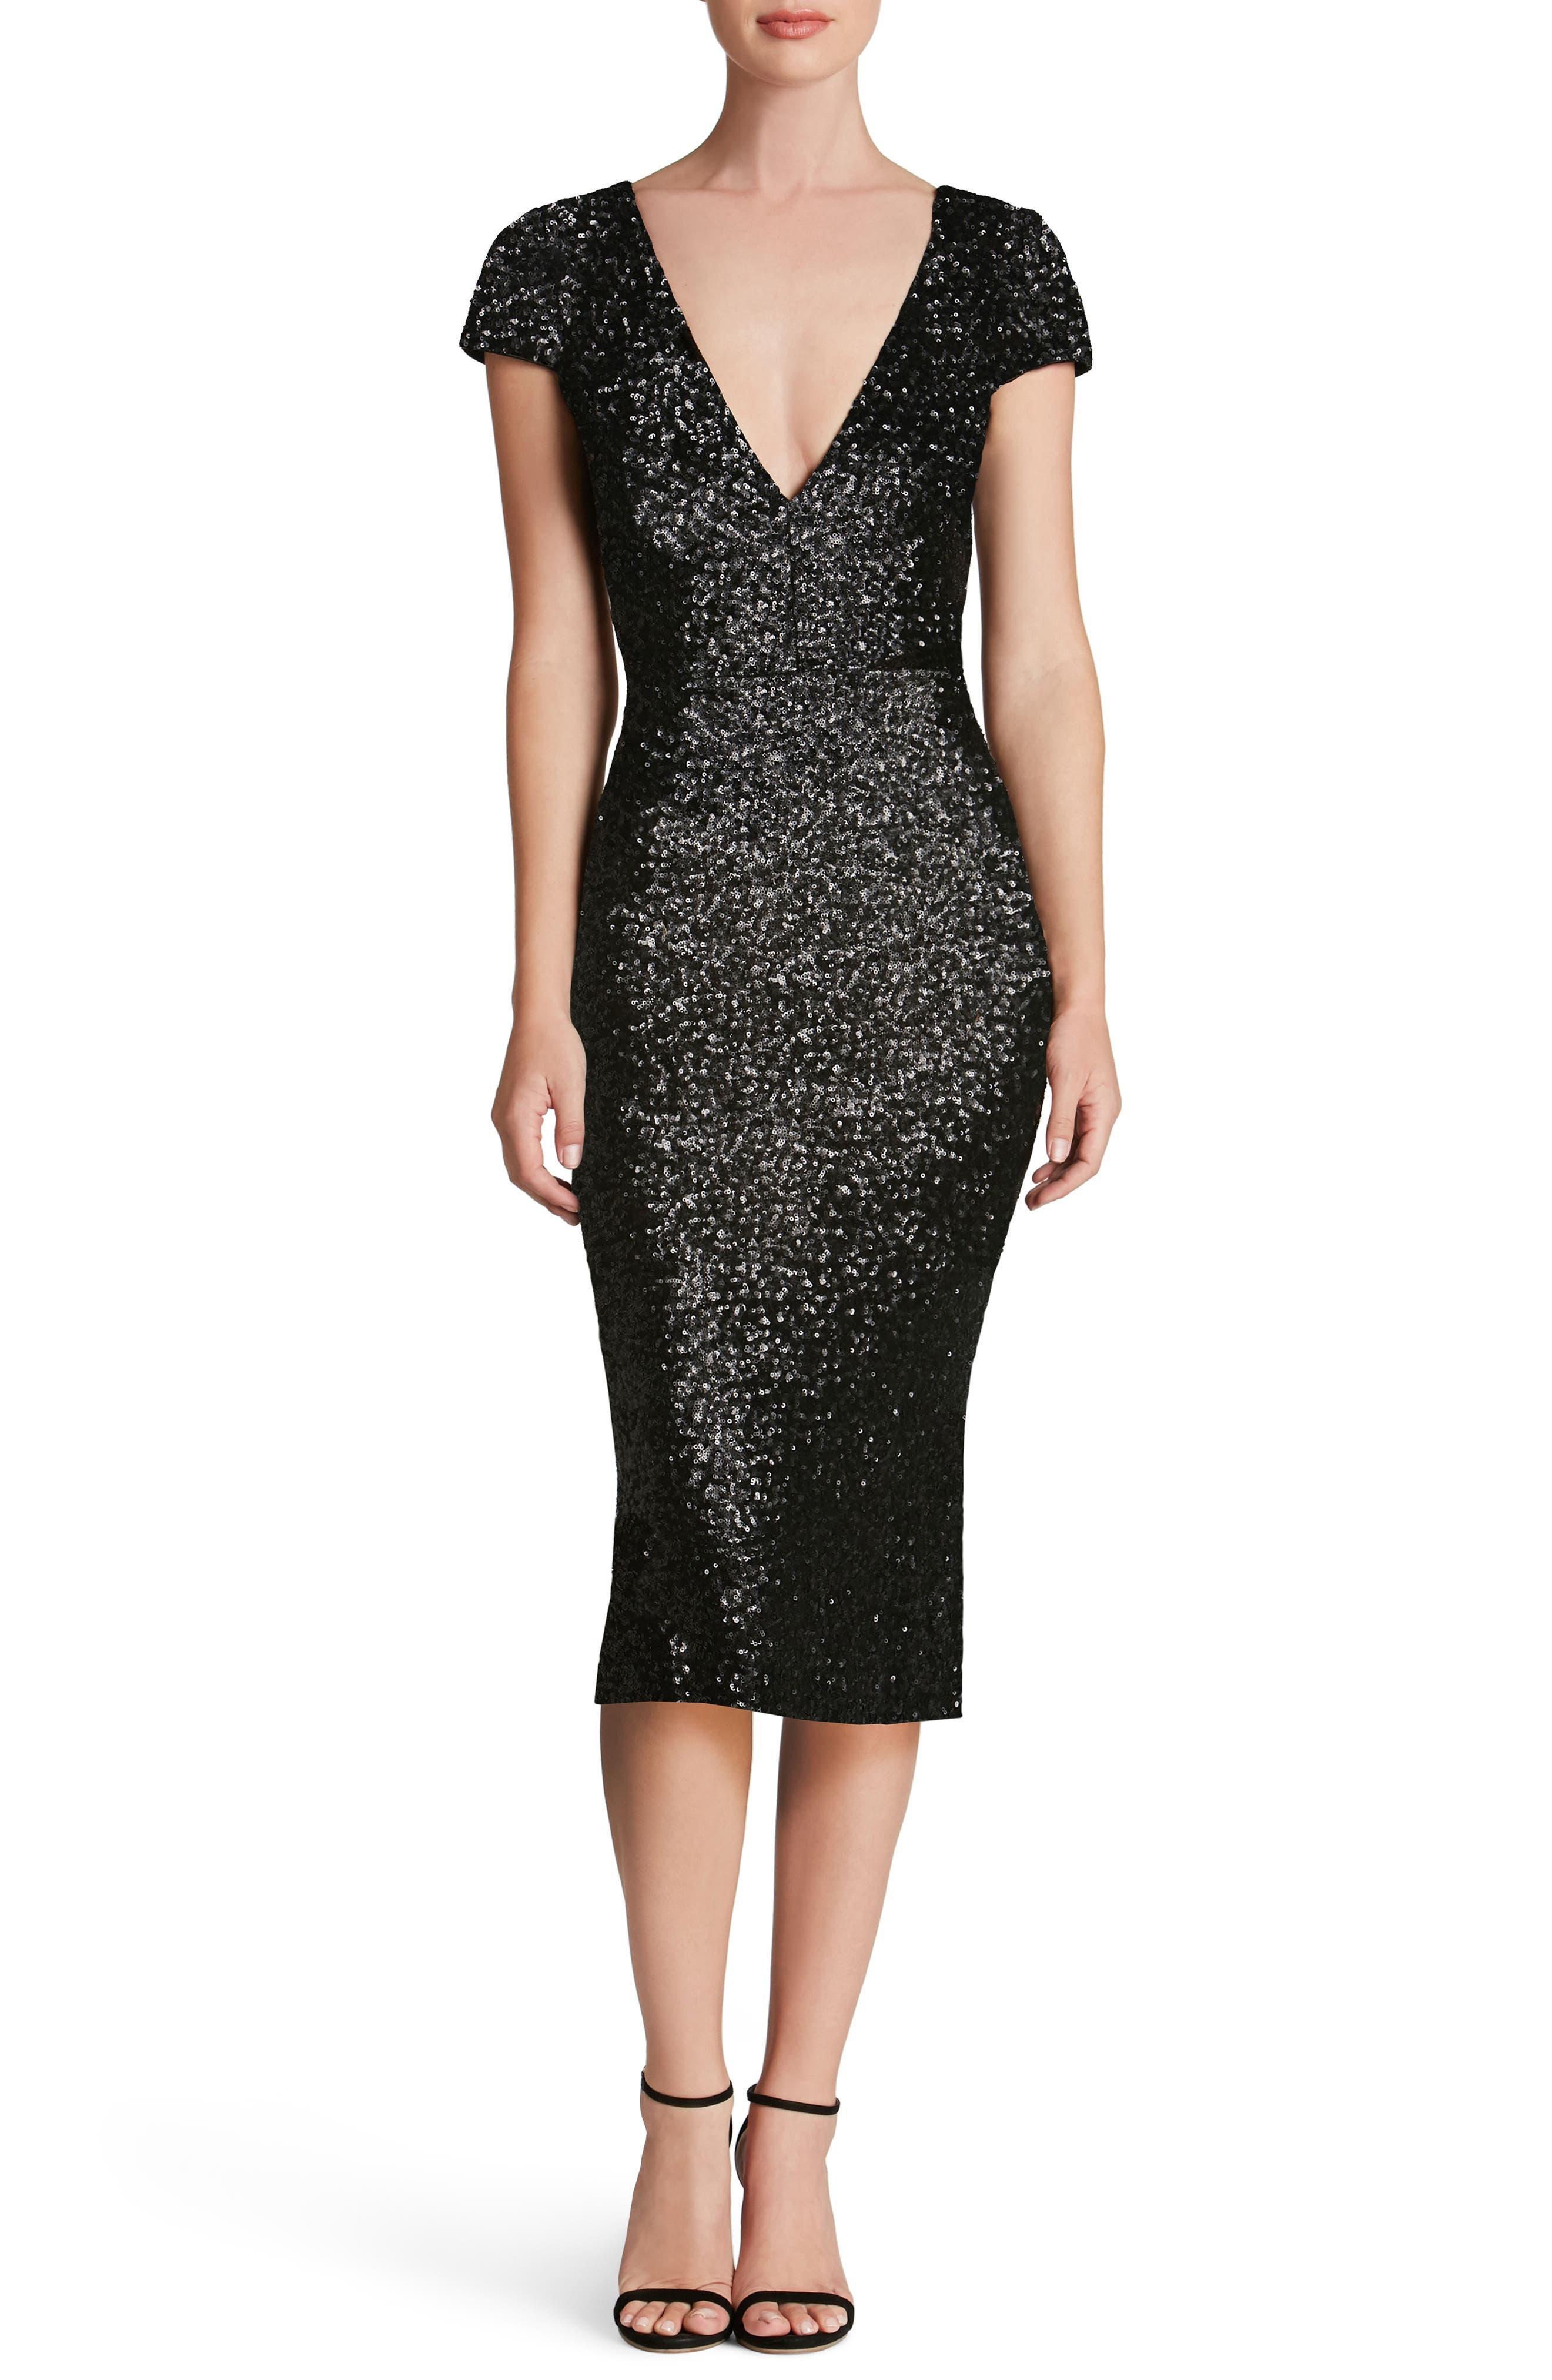 Alternate Image 1 Selected - Dress the Population Allison Sequin Sheath Dress